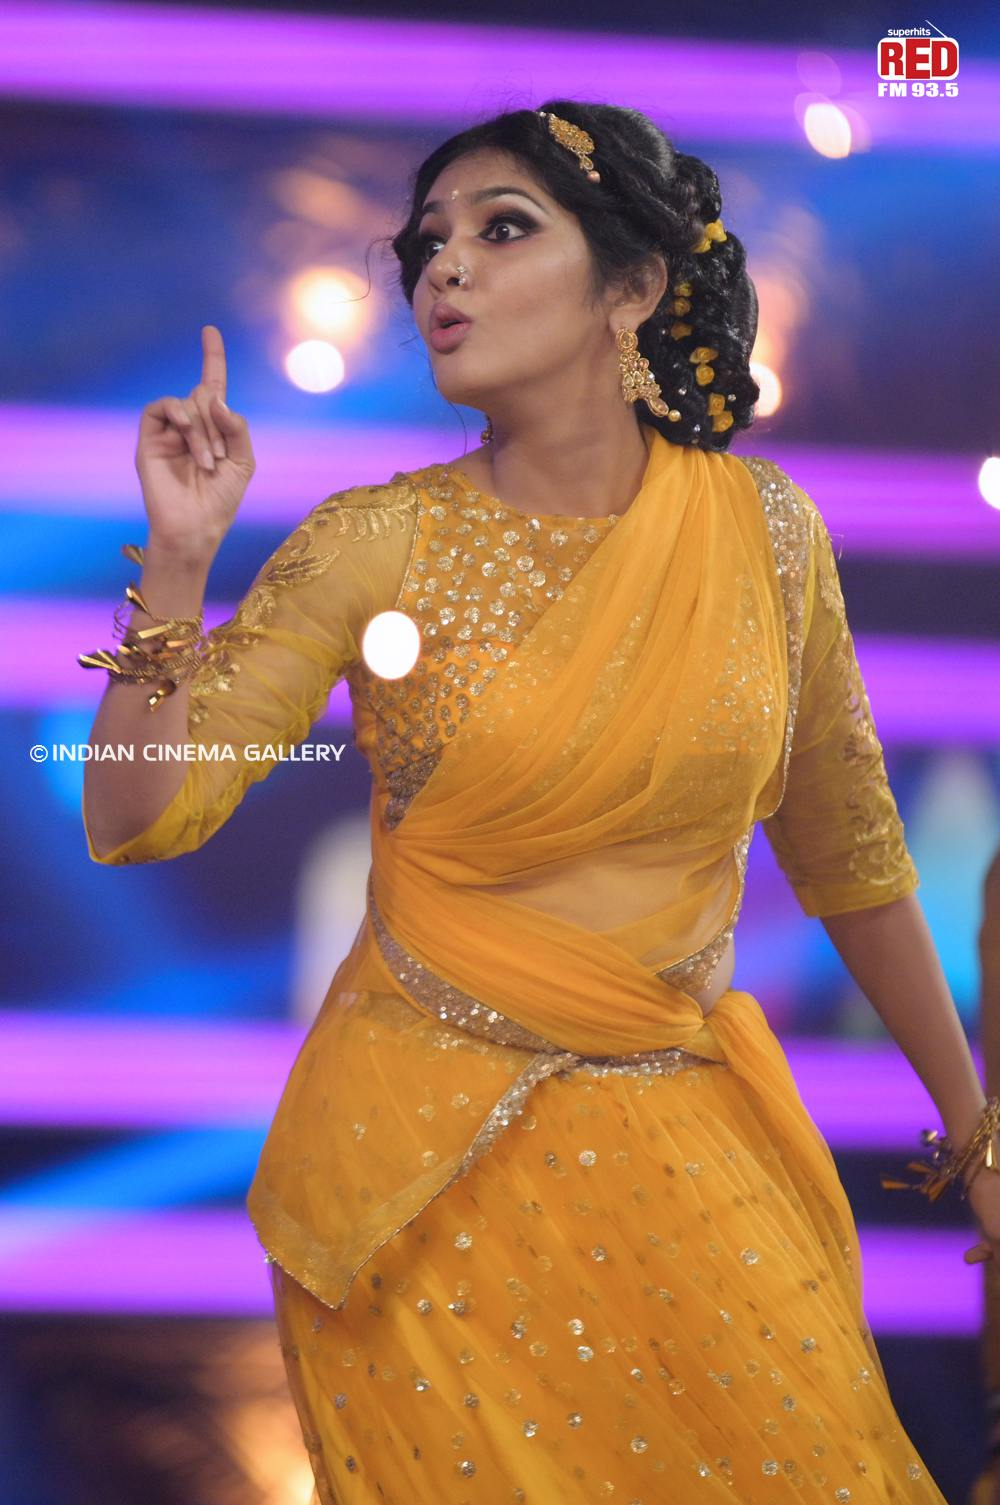 Gayathri Suresh dance at red fm music awards 2019 (30)